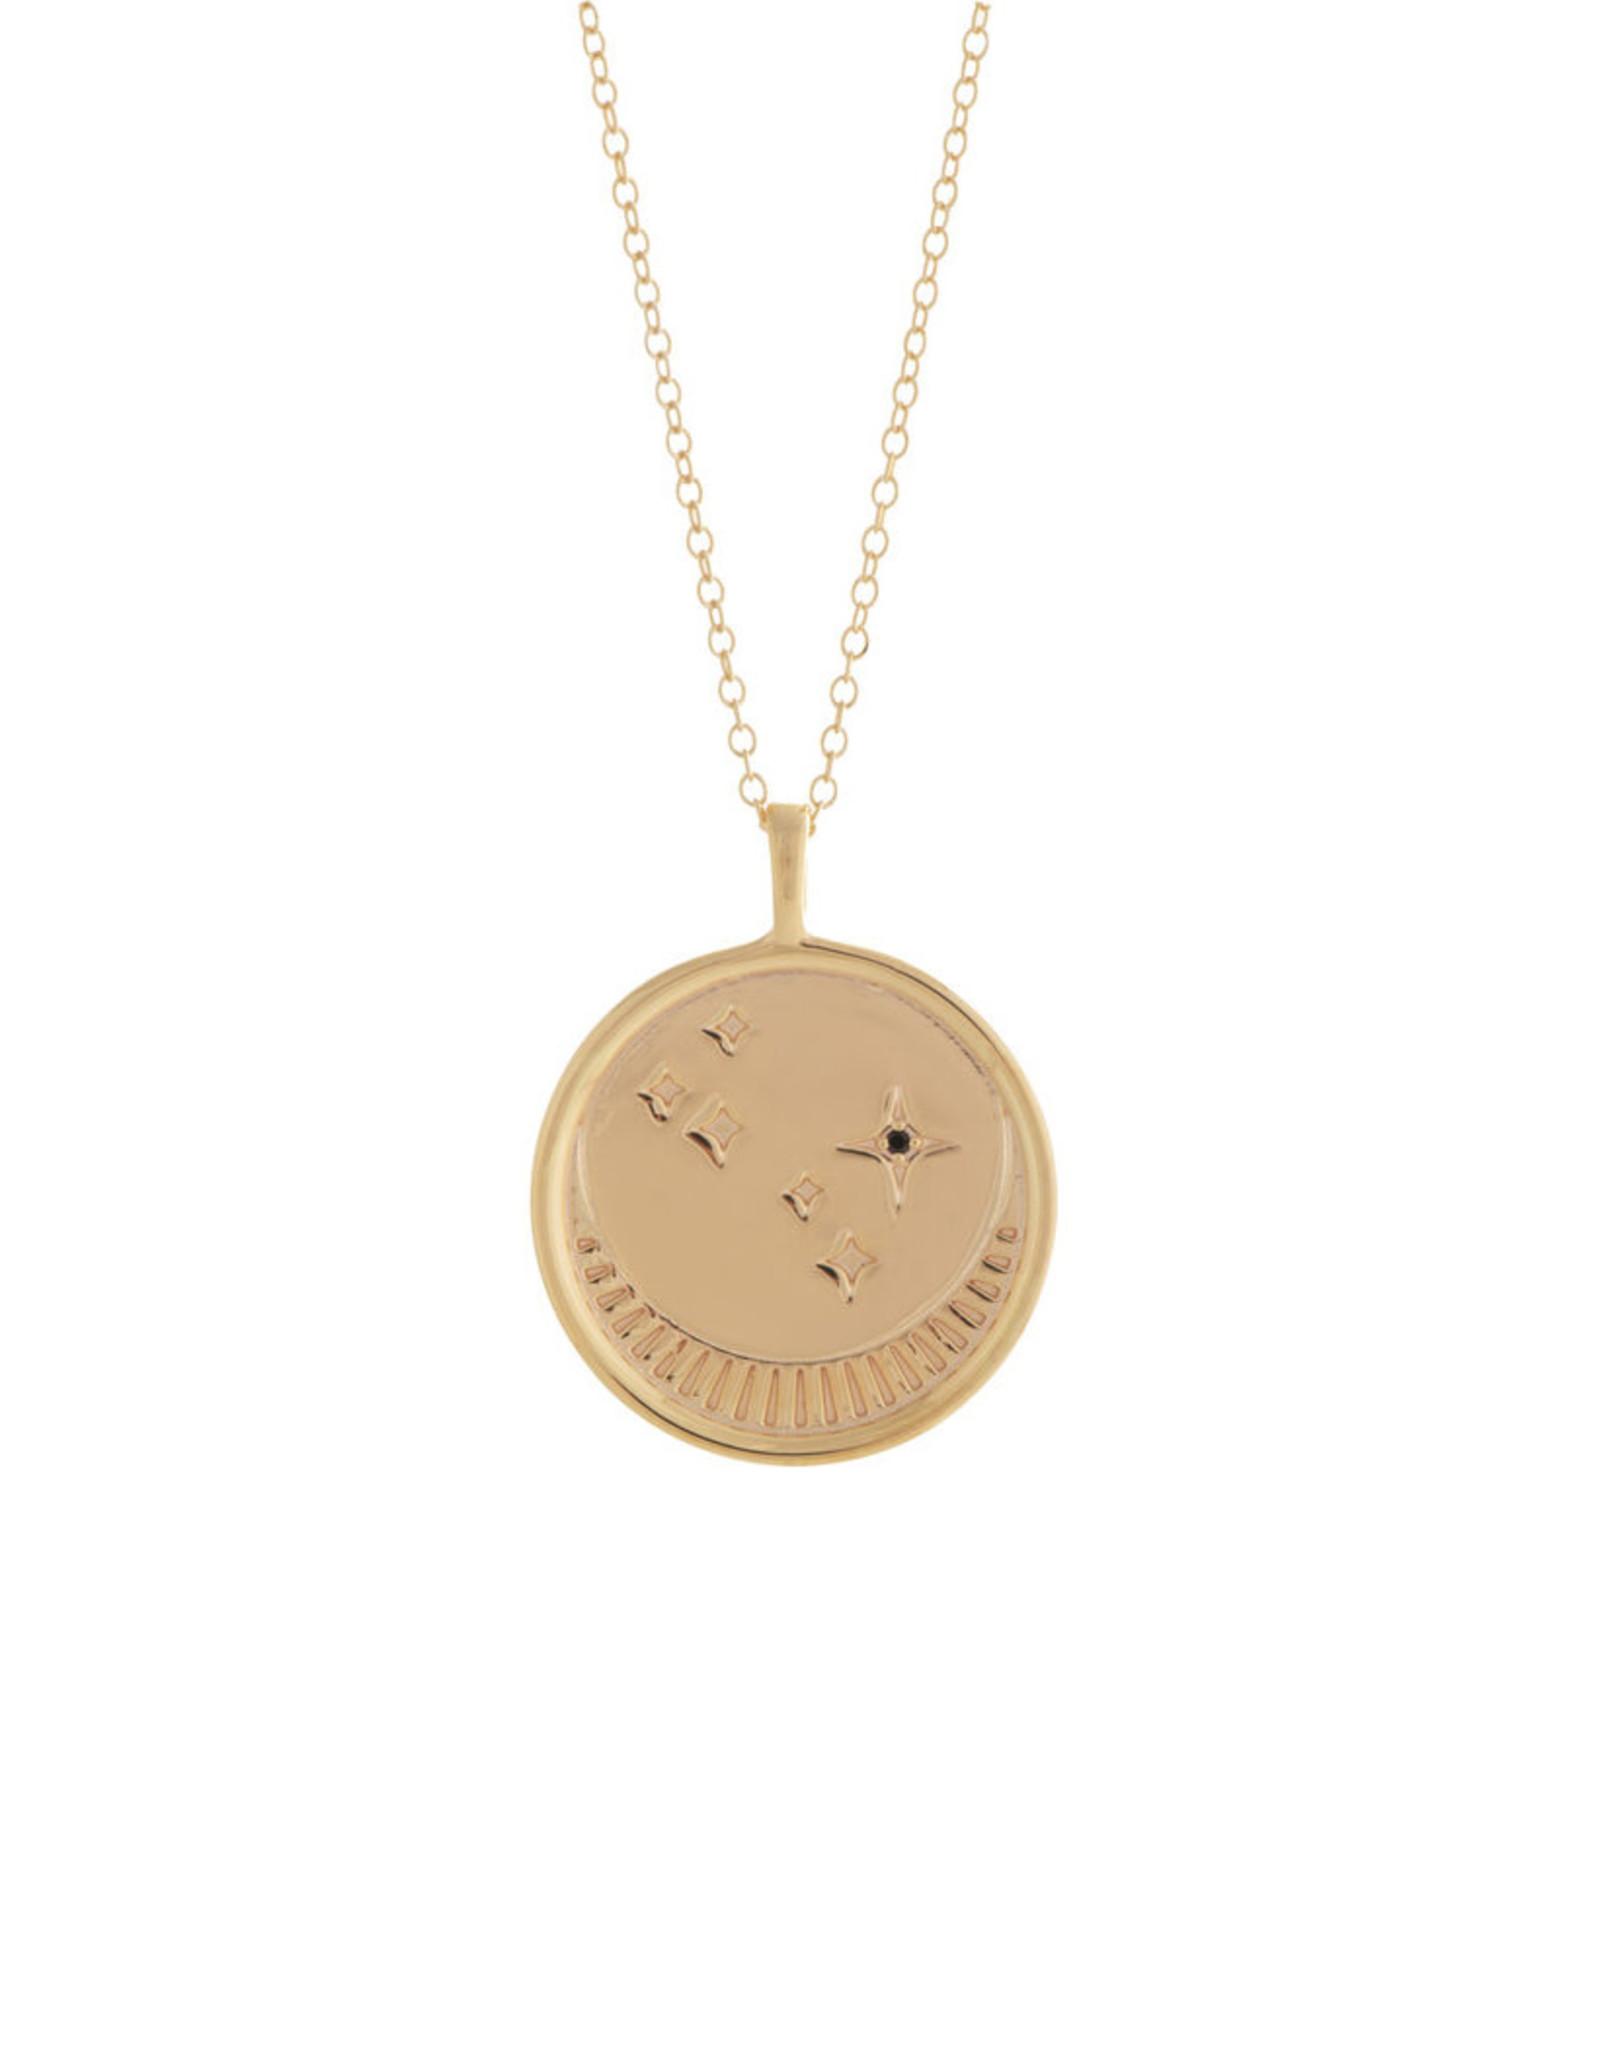 Sarah Mulder Jewelry Gold Franz Necklace - Onyx